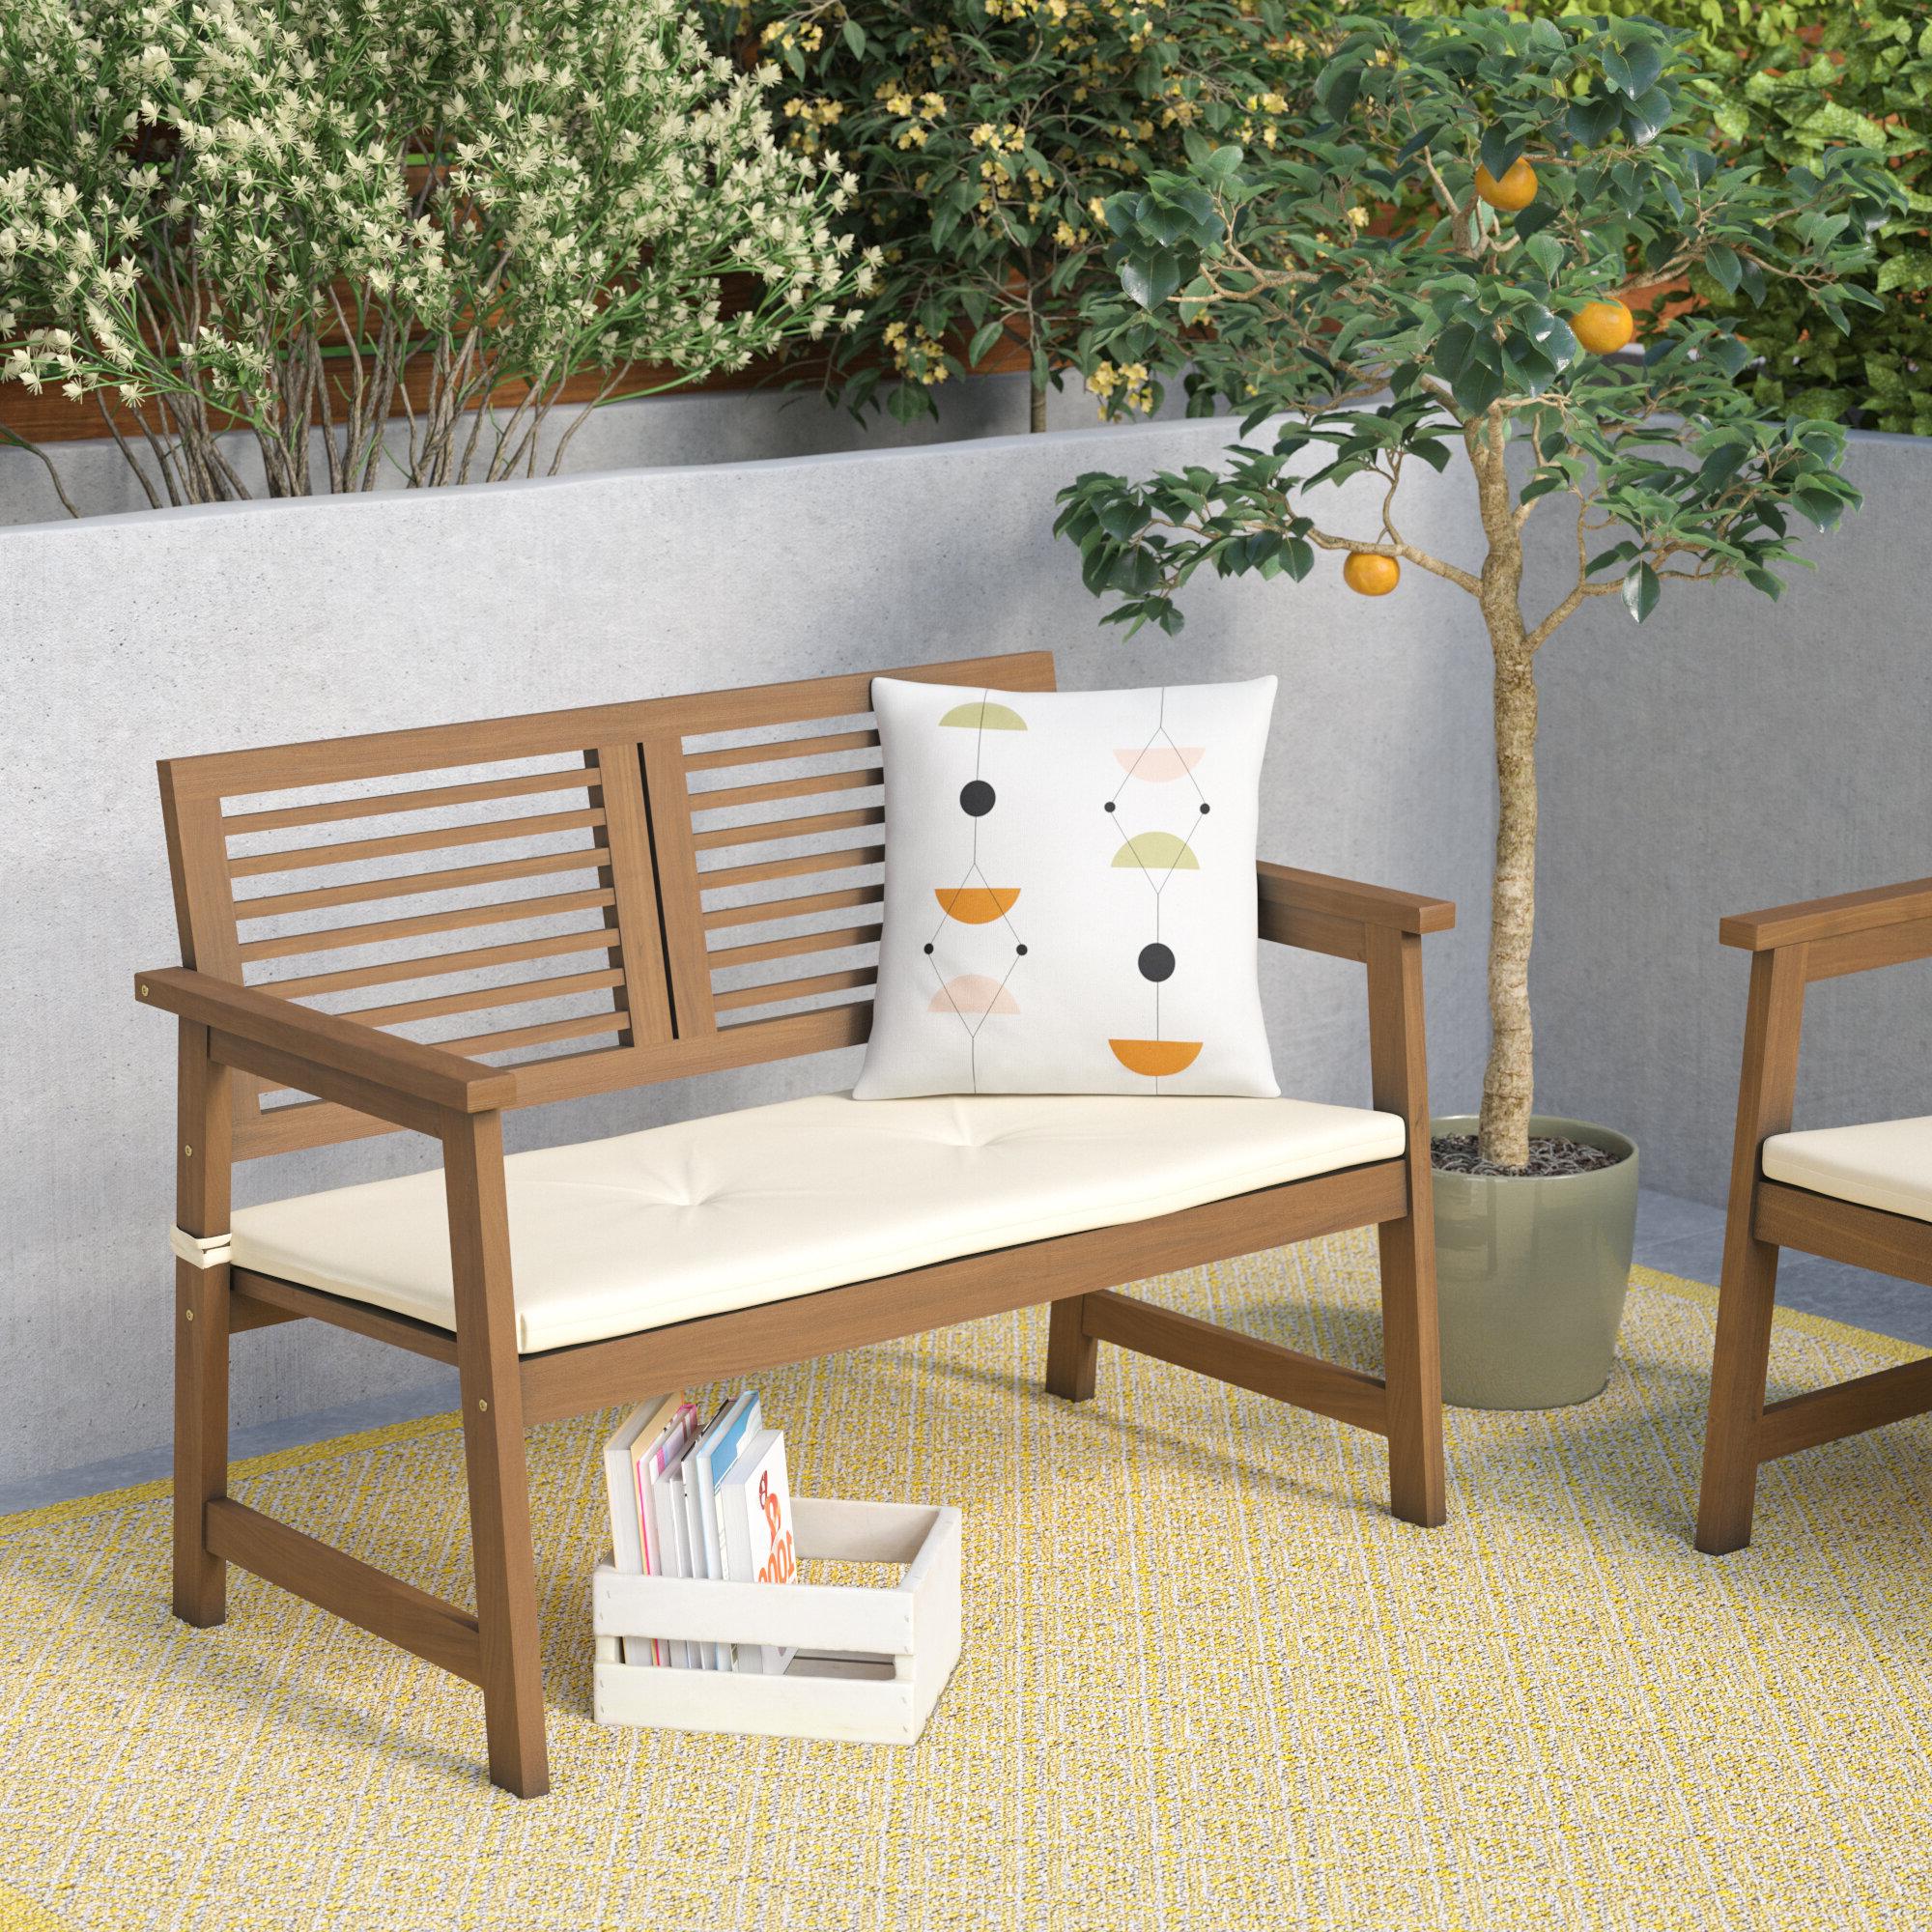 Avoca Wood Garden Benches With Regard To Favorite Arianna Meranti Wooden Garden Bench (View 12 of 30)